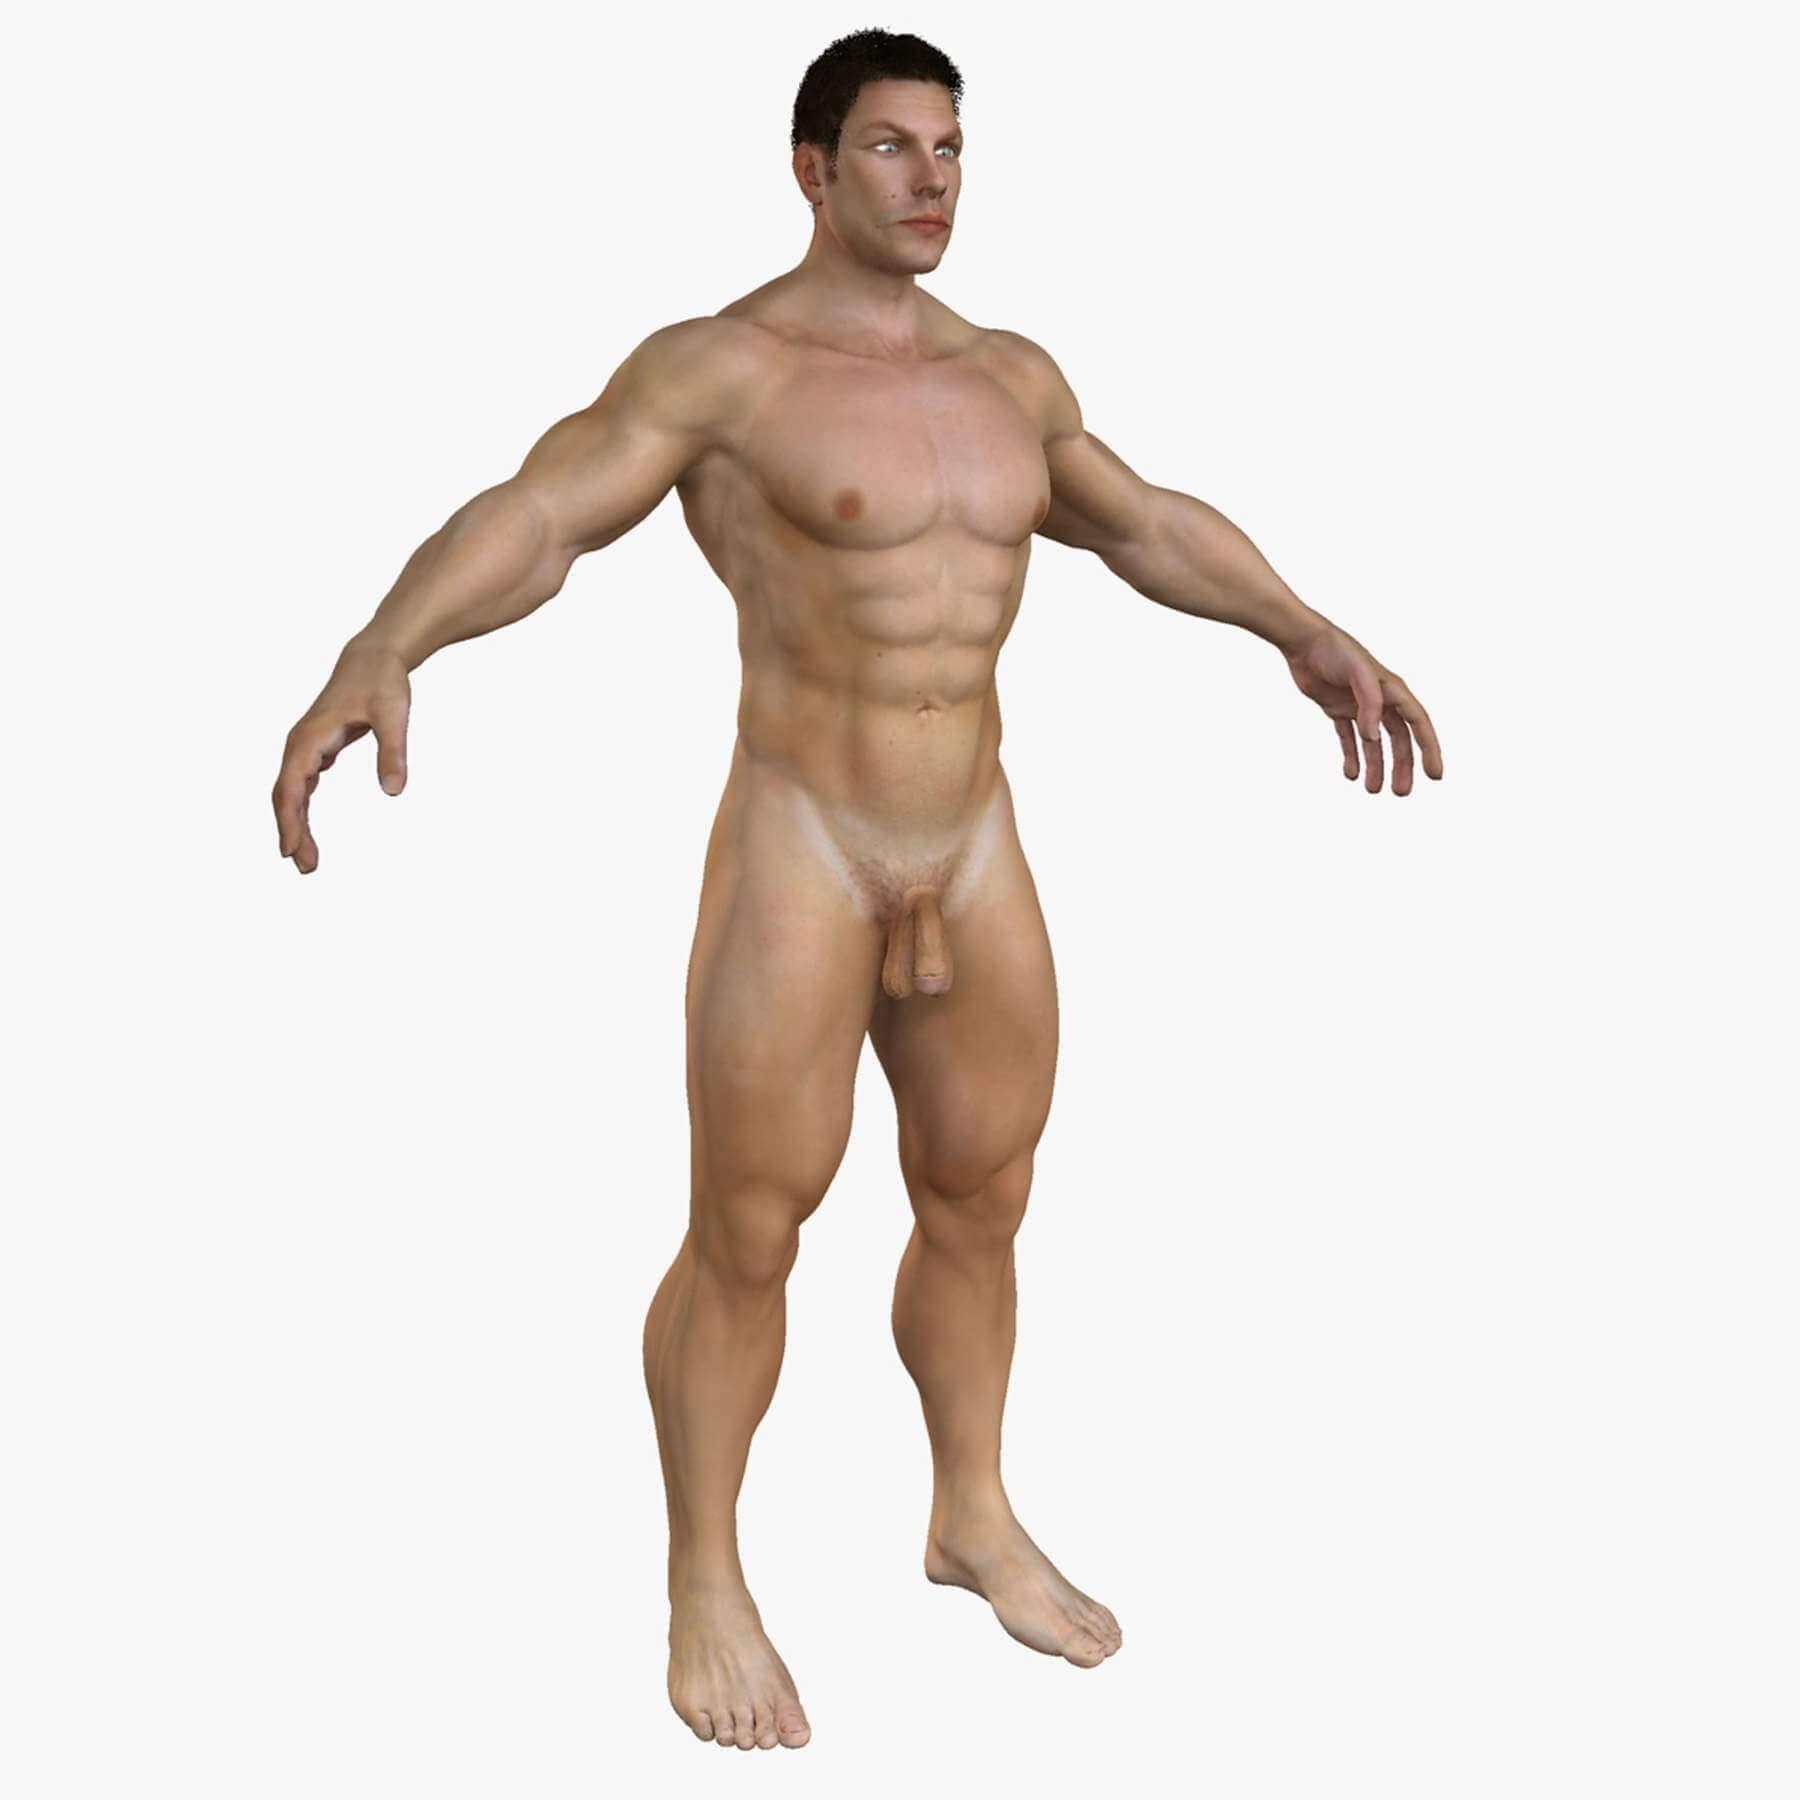 Male Full Body Anatomy 3d Model